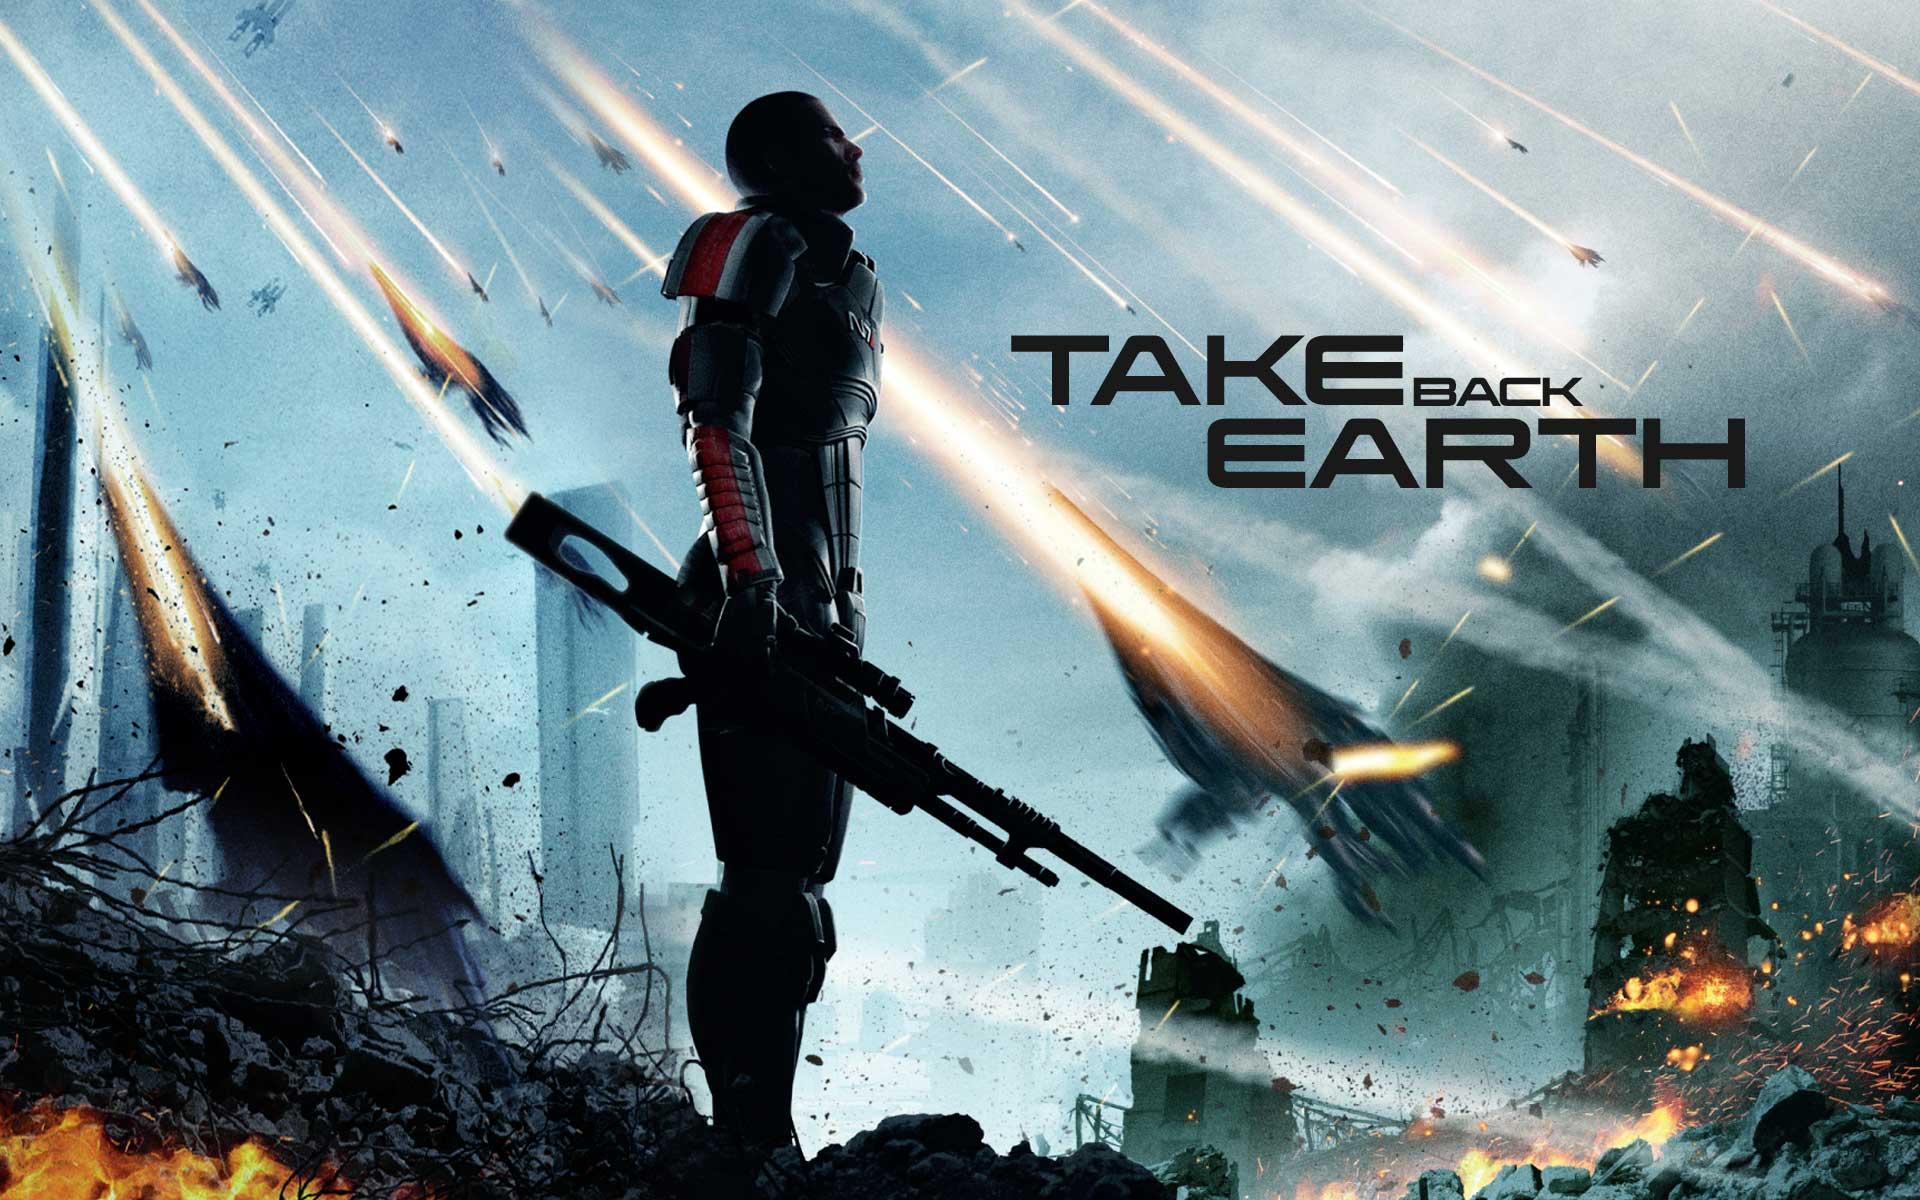 Mass Effect 3 Wallpapers   Full HD wallpaper search 1920x1200